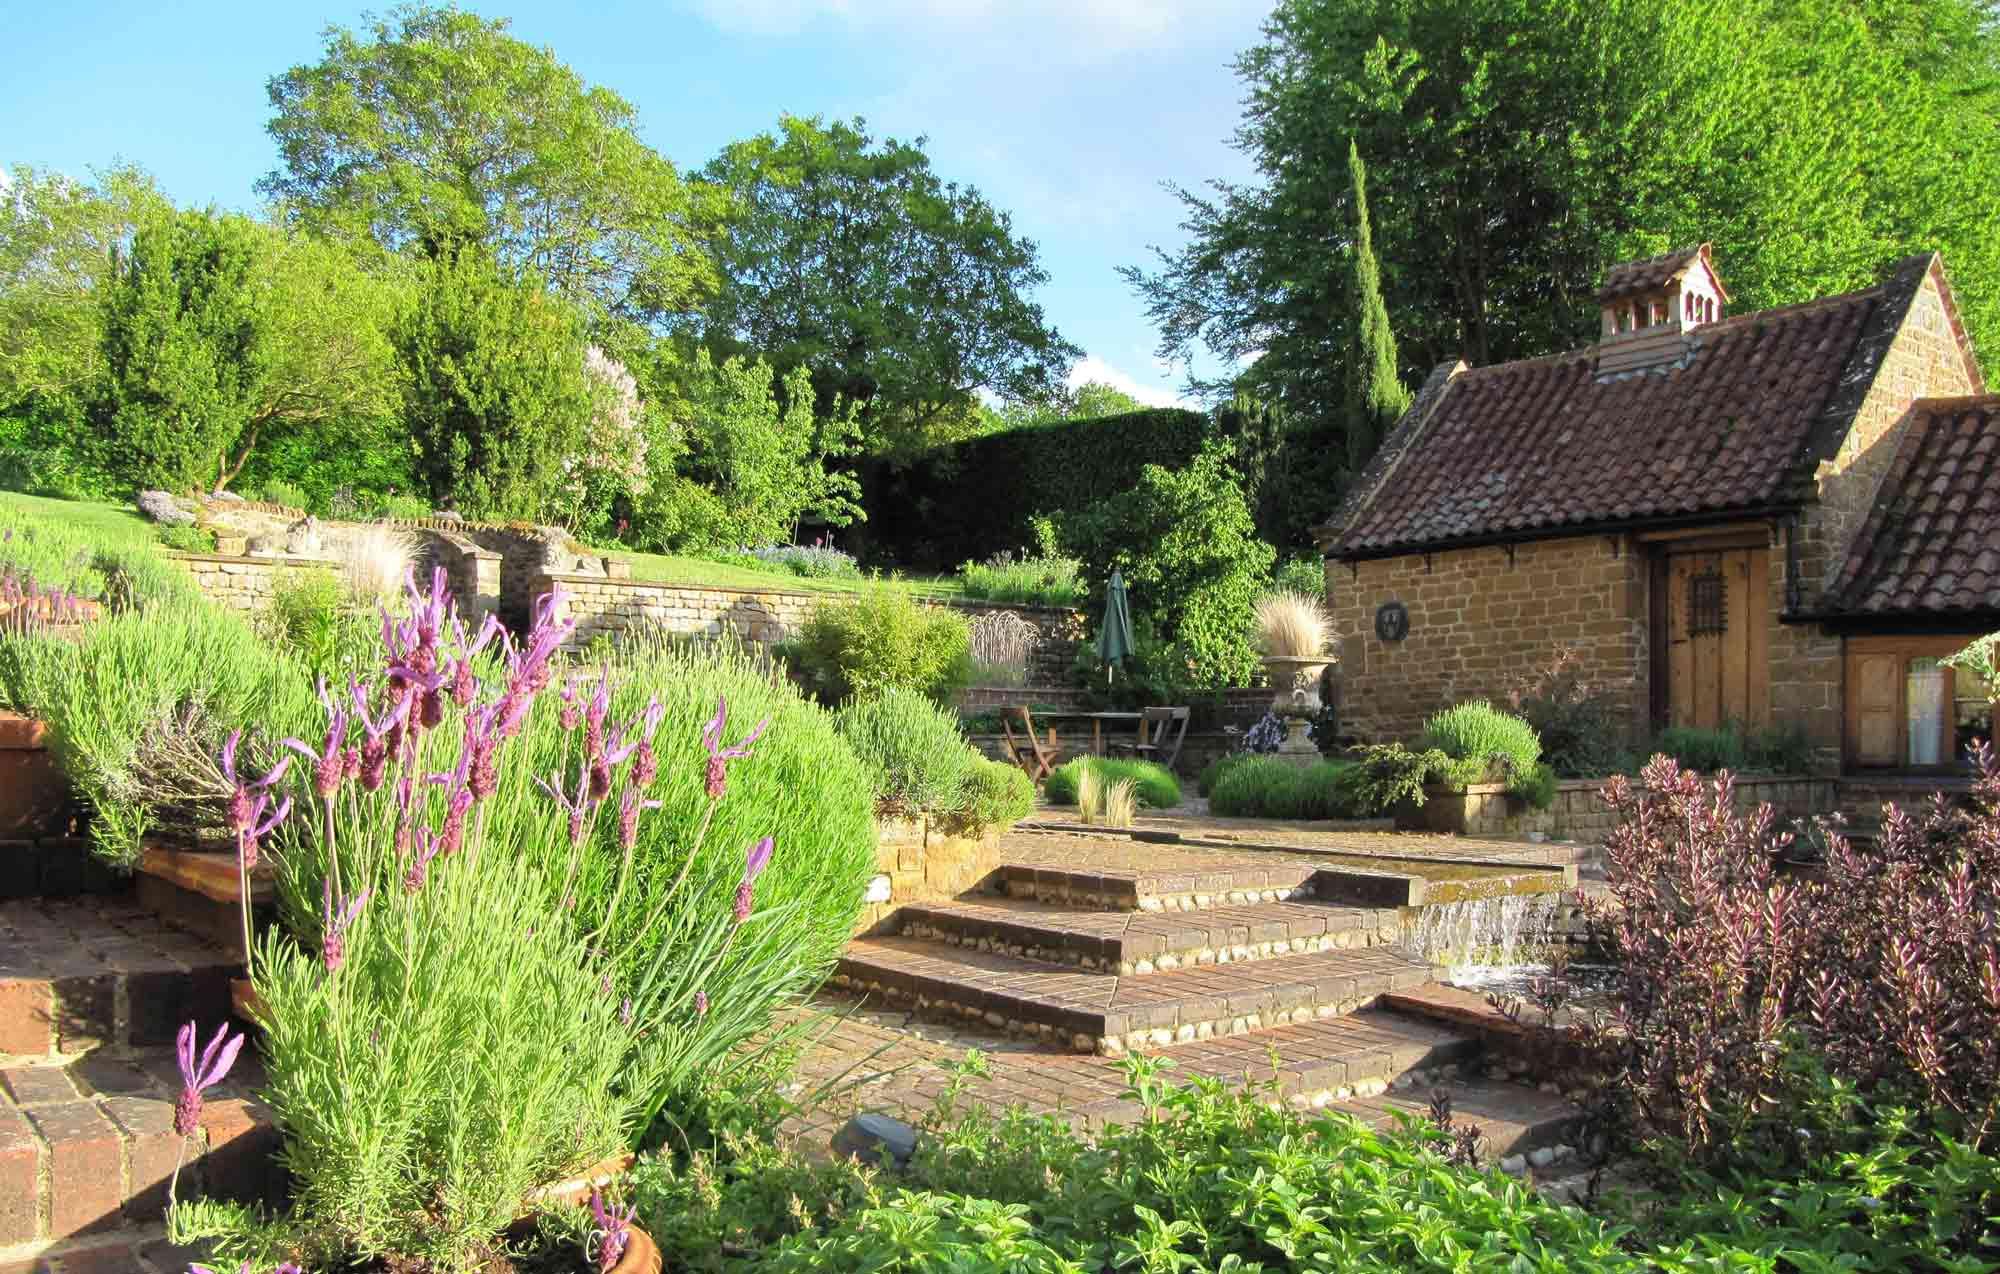 Heath Farm Cottages - Courtyard Steps